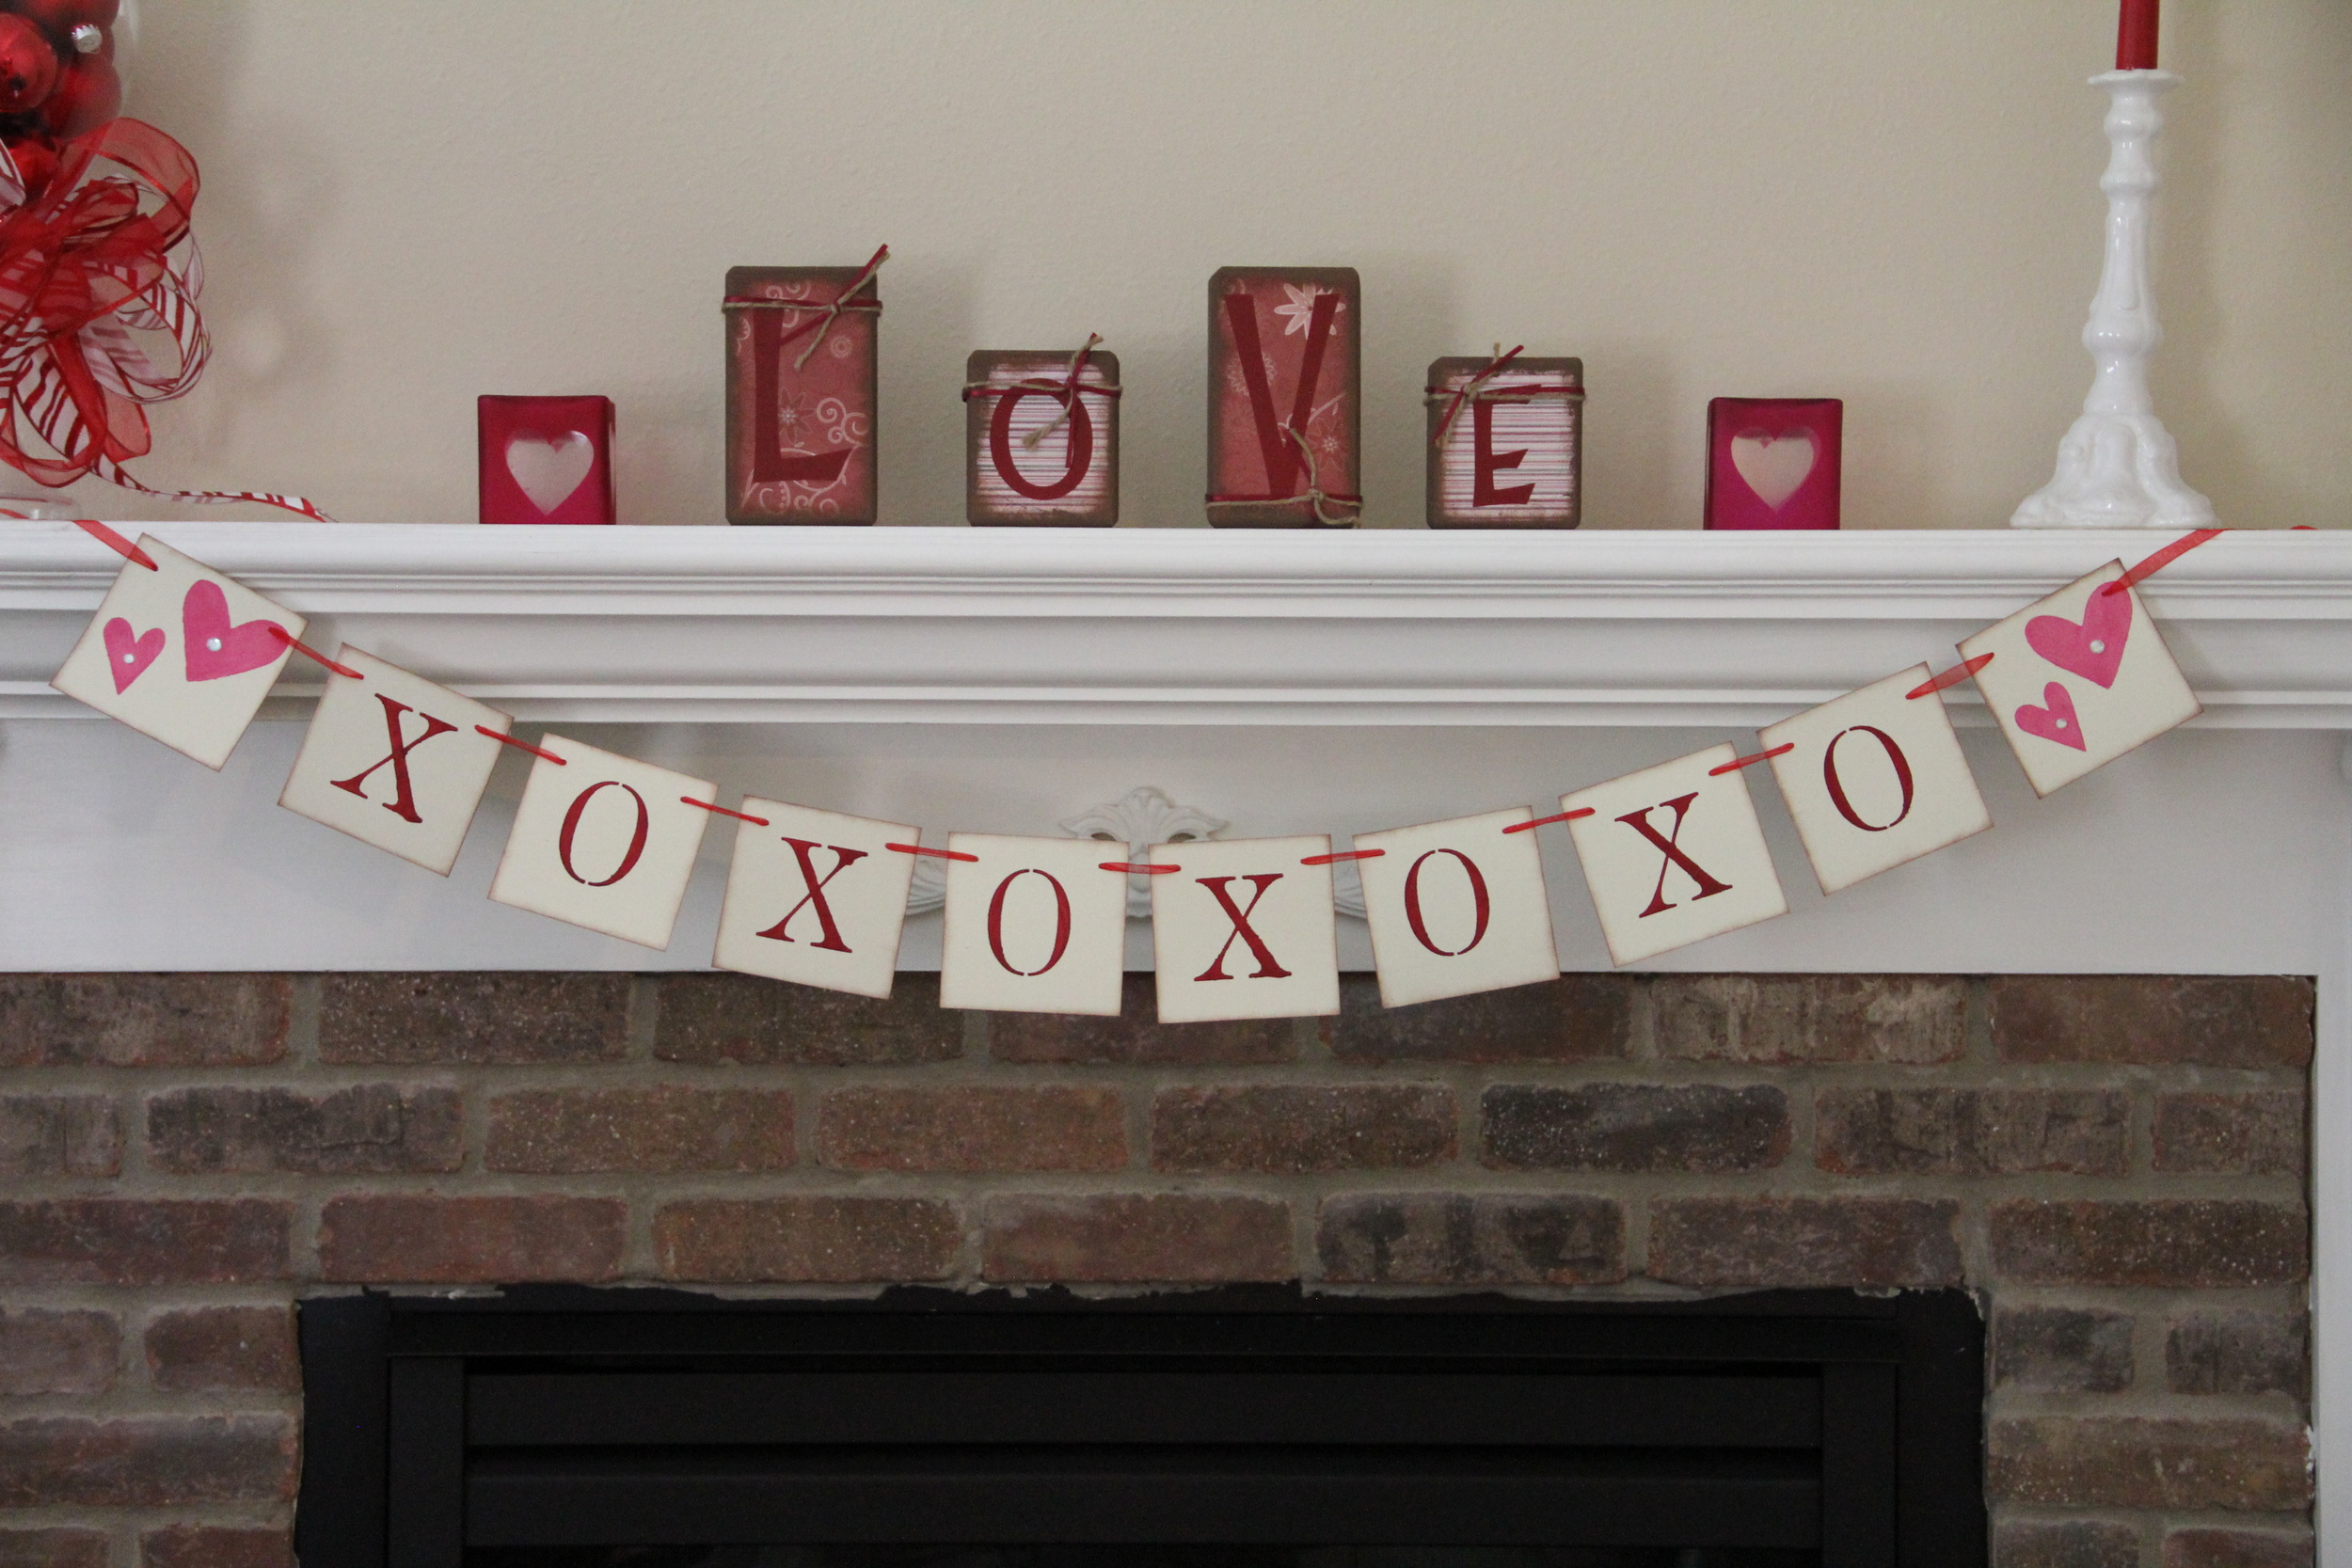 IMG_3516 onetinyheart valentines banner decoration.JPG